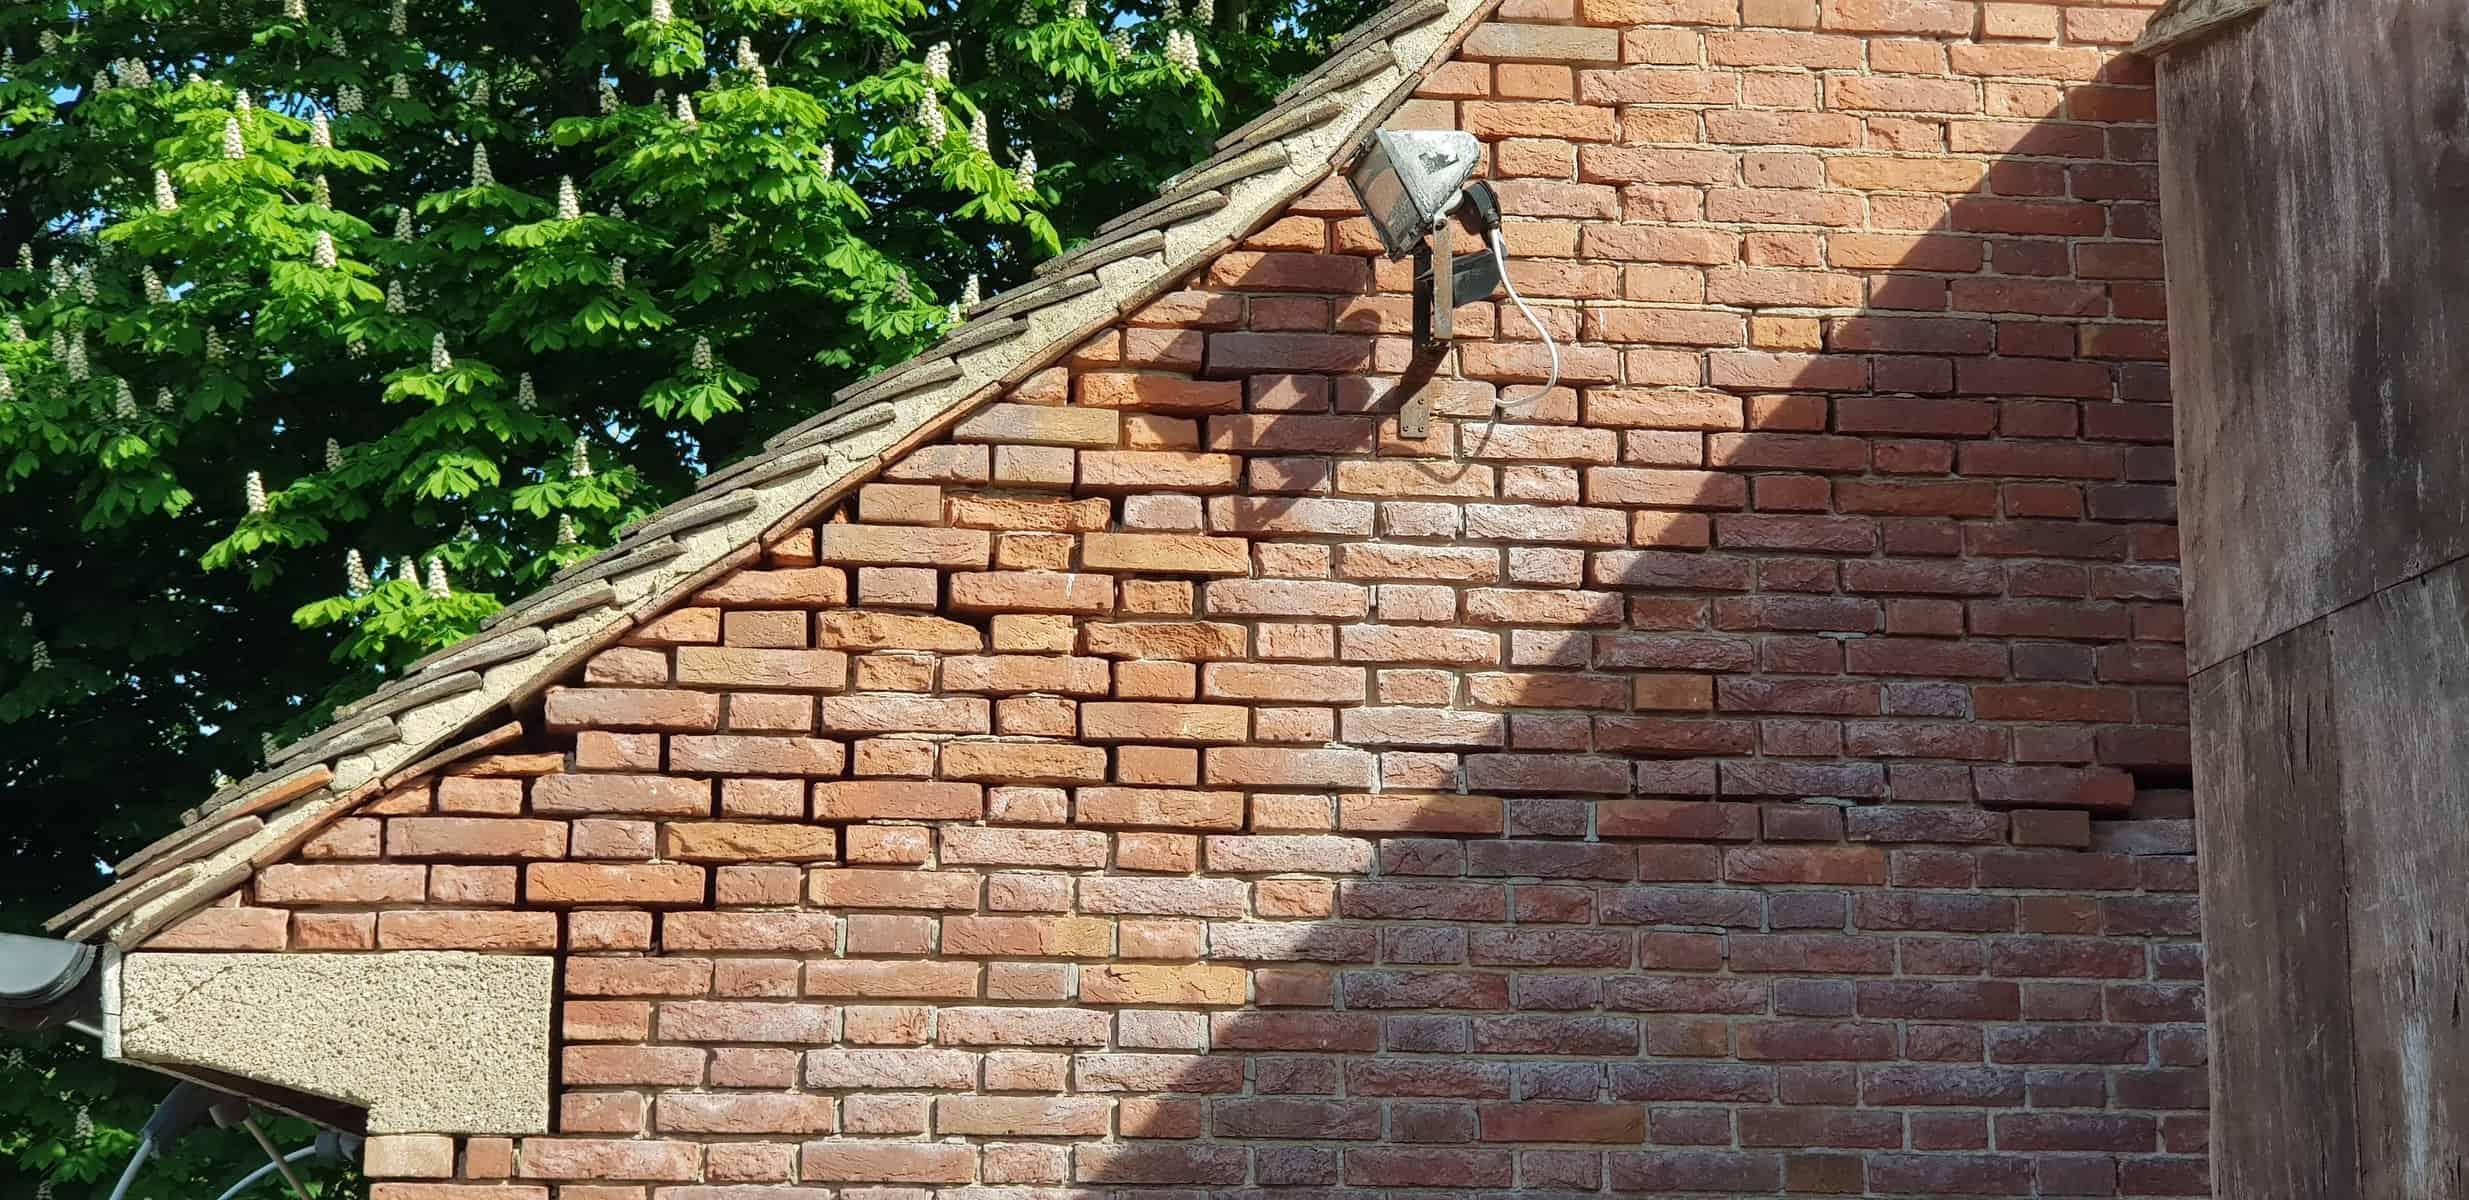 Derby Bat Survey - Missing mortar in wall